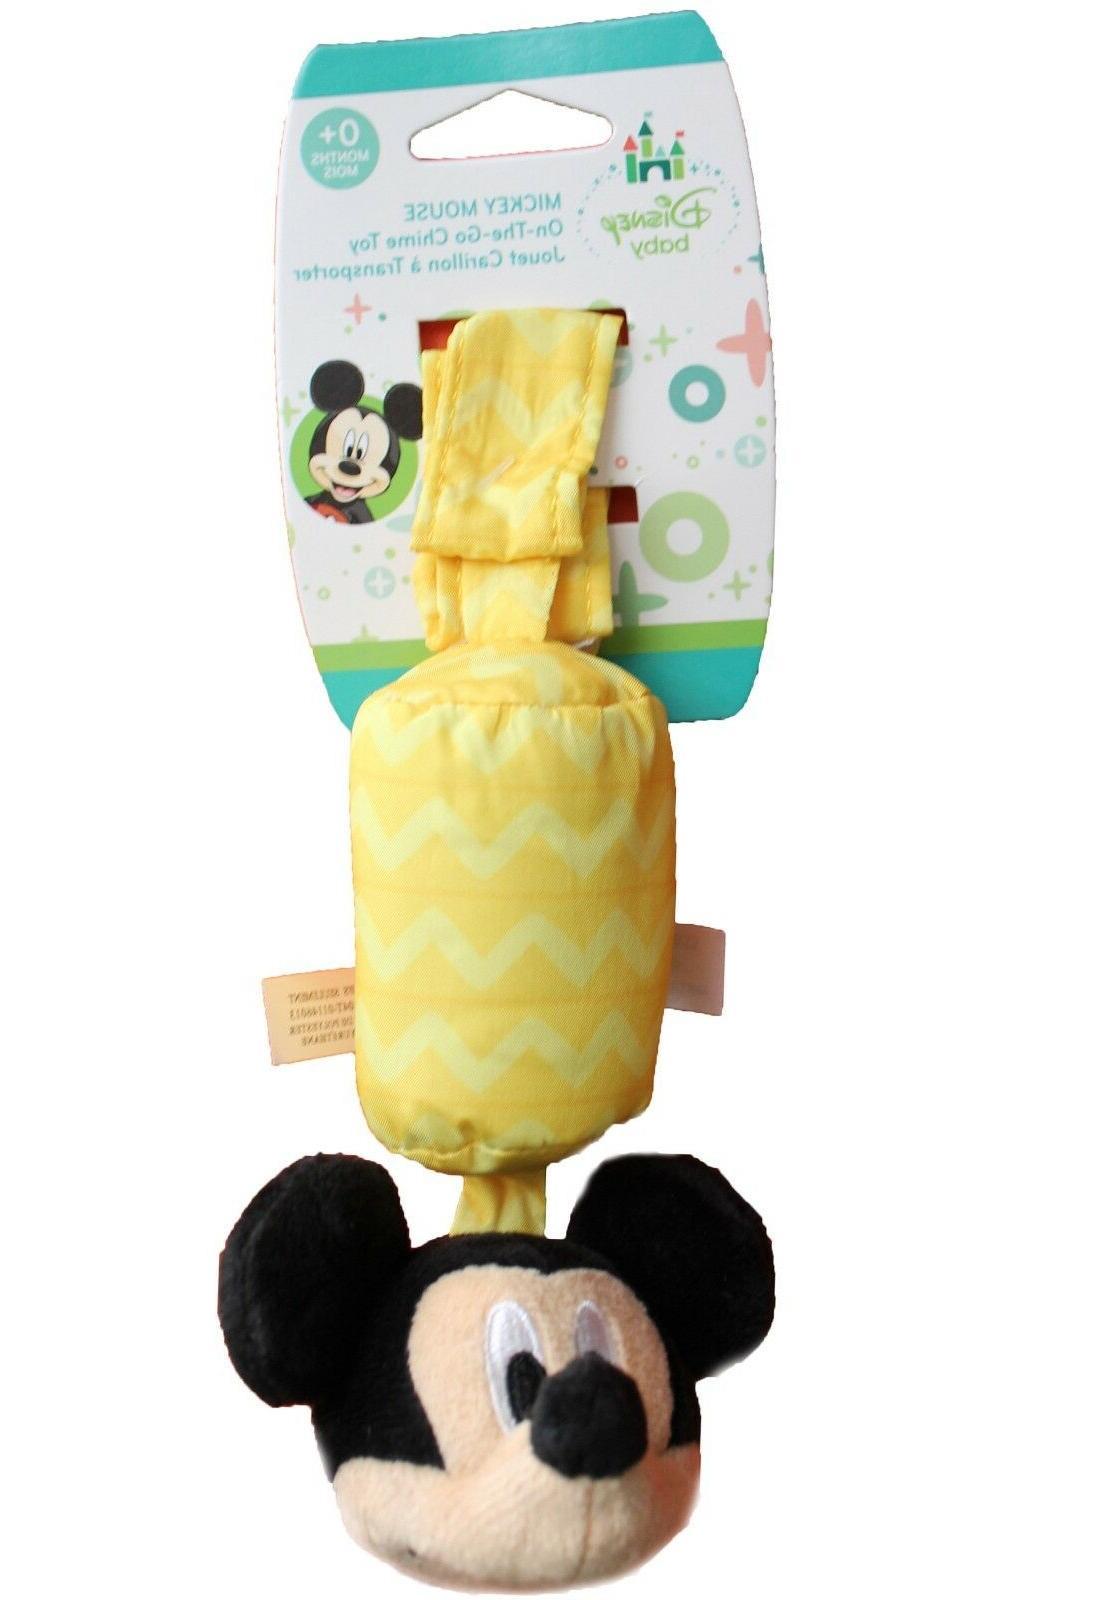 new mickey mouse plush take along chime